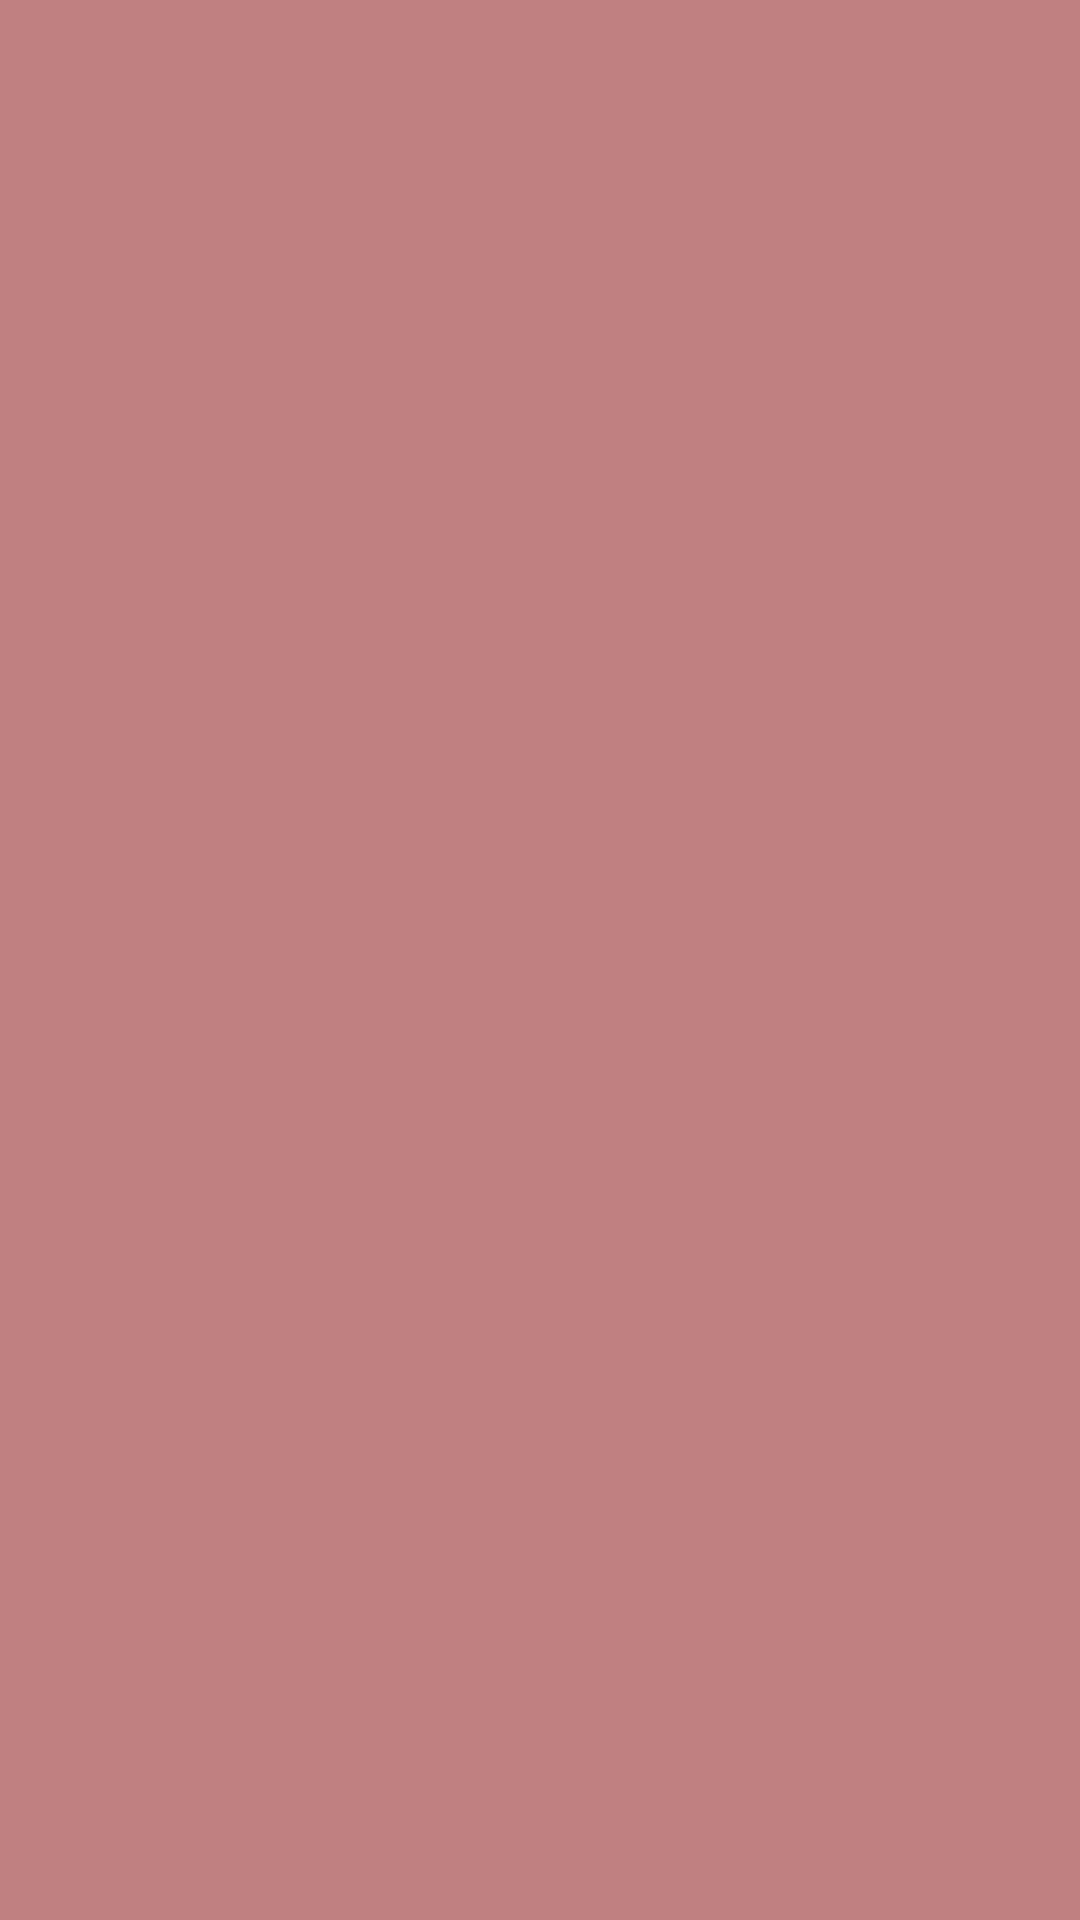 1080x1920 Old Rose Solid Color Background